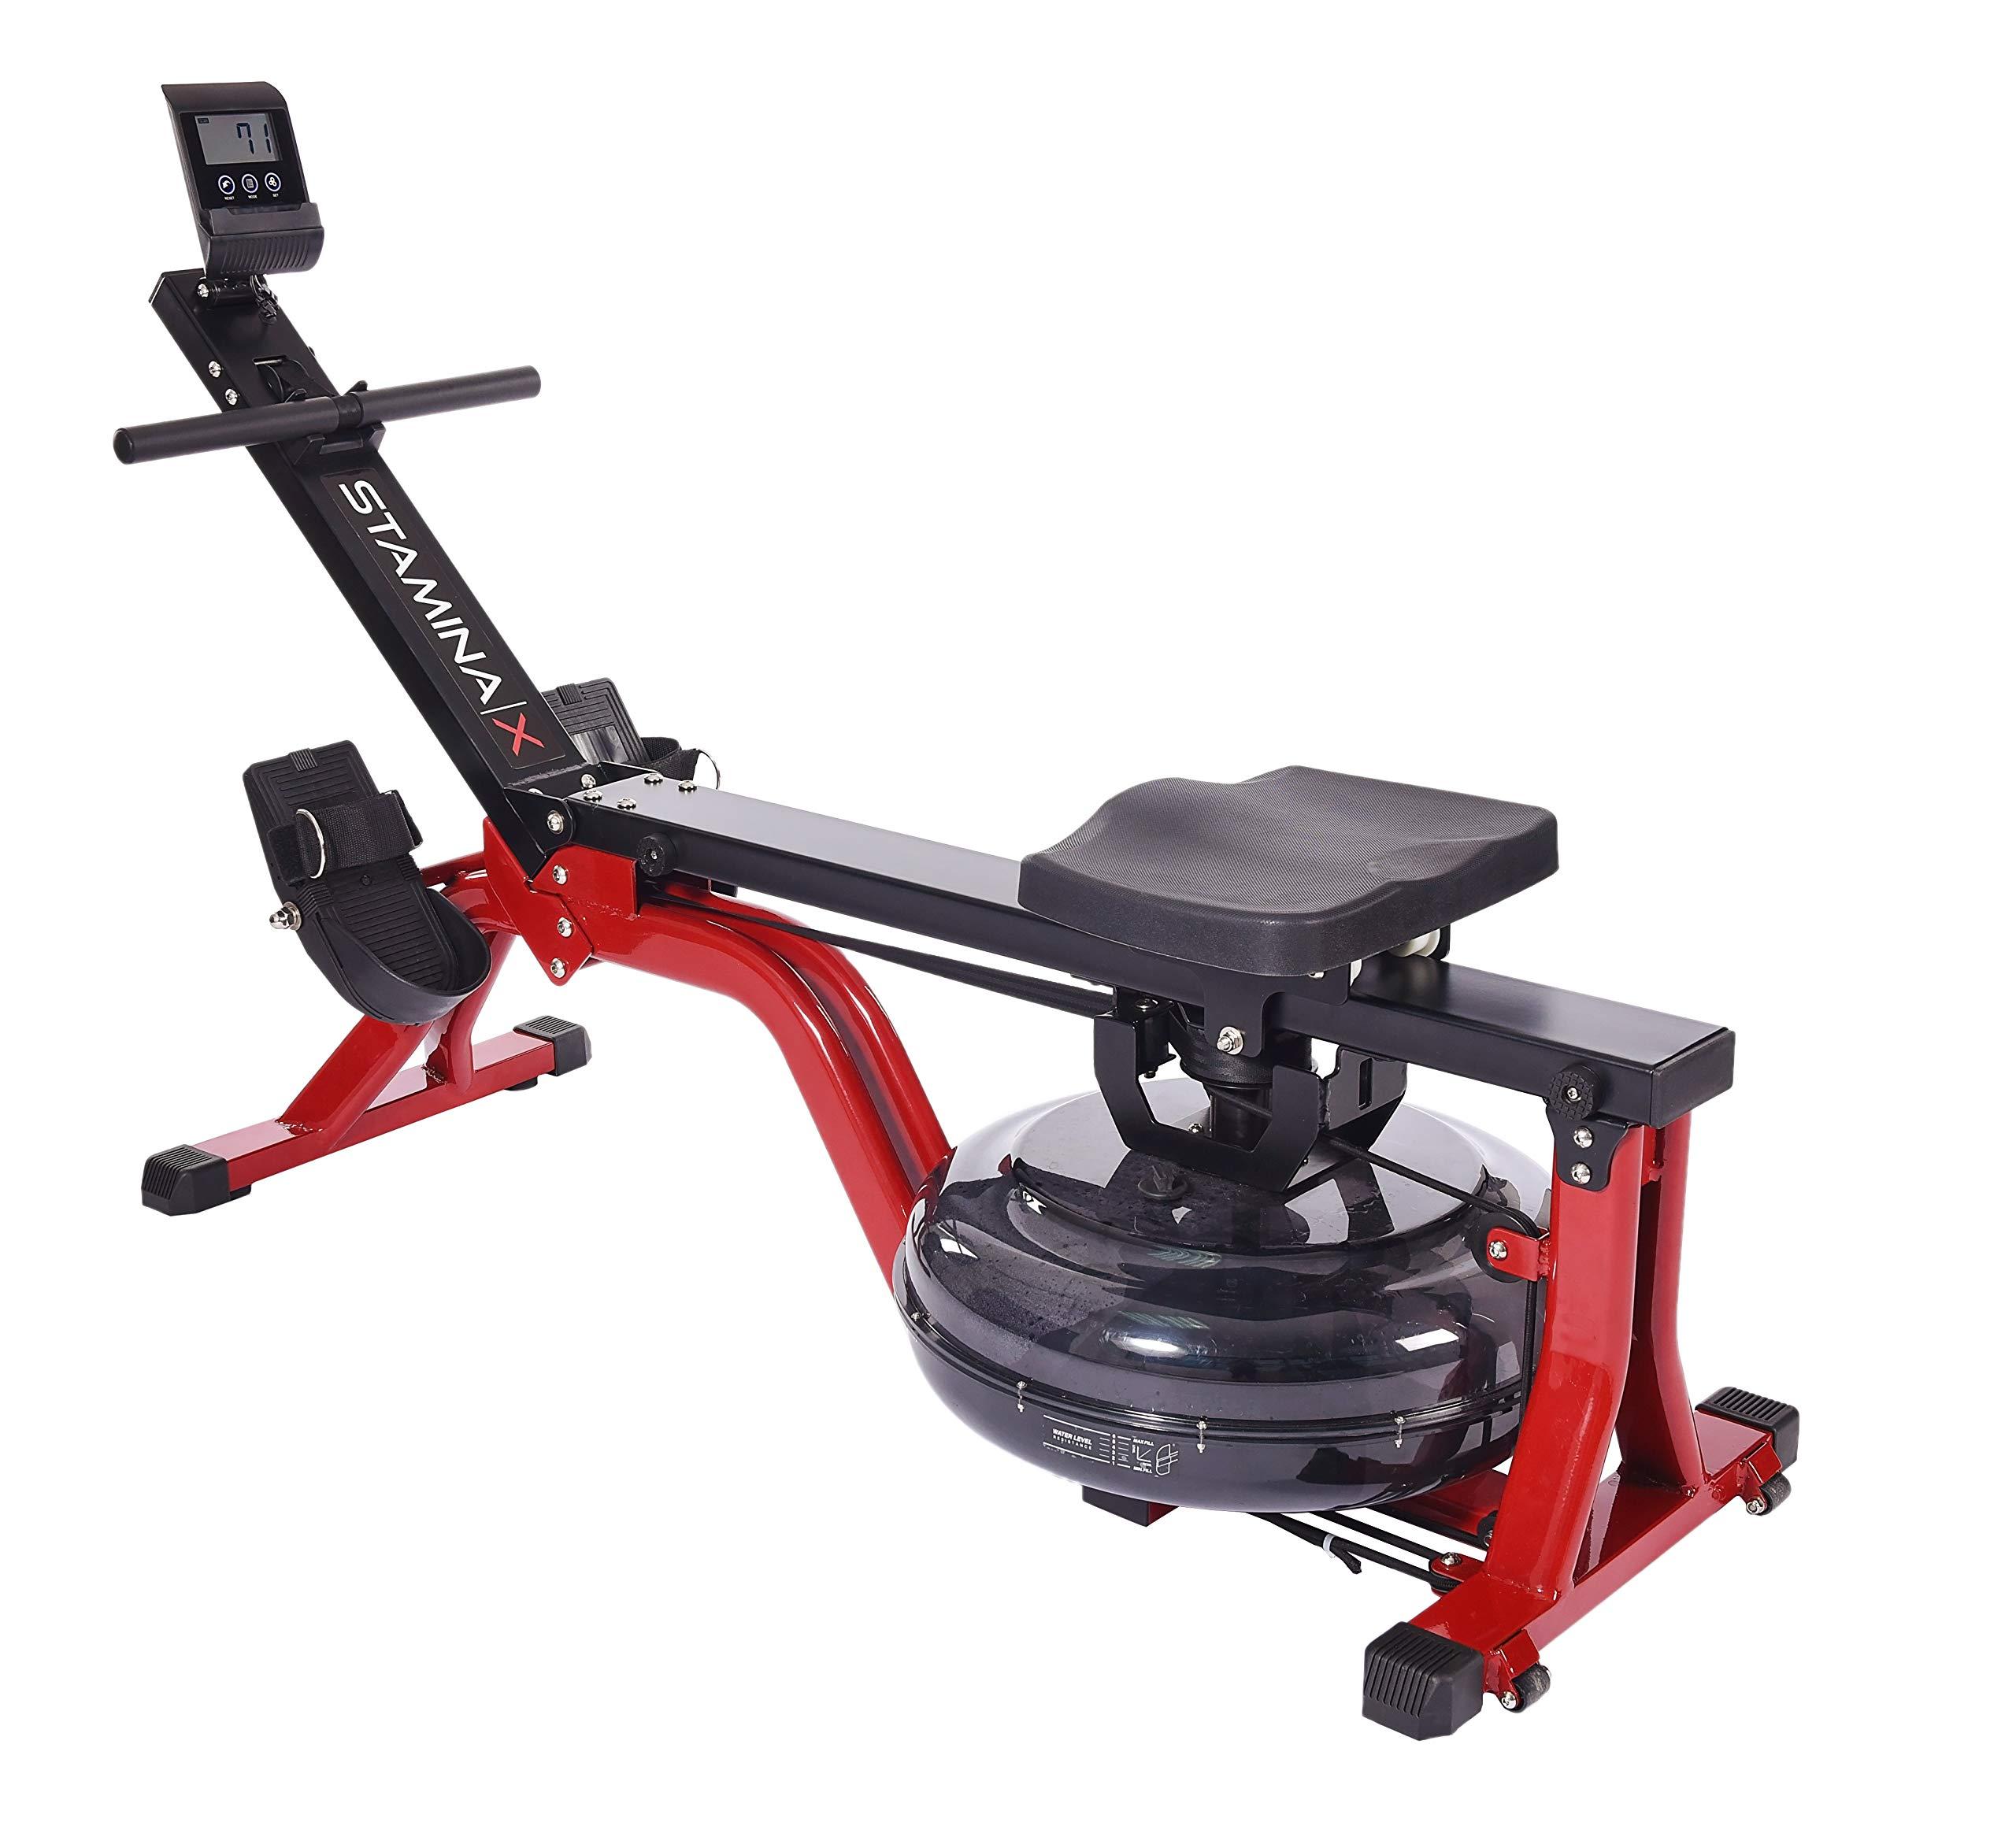 Stamina   X Water Rower, Black/Red by Stamina   X